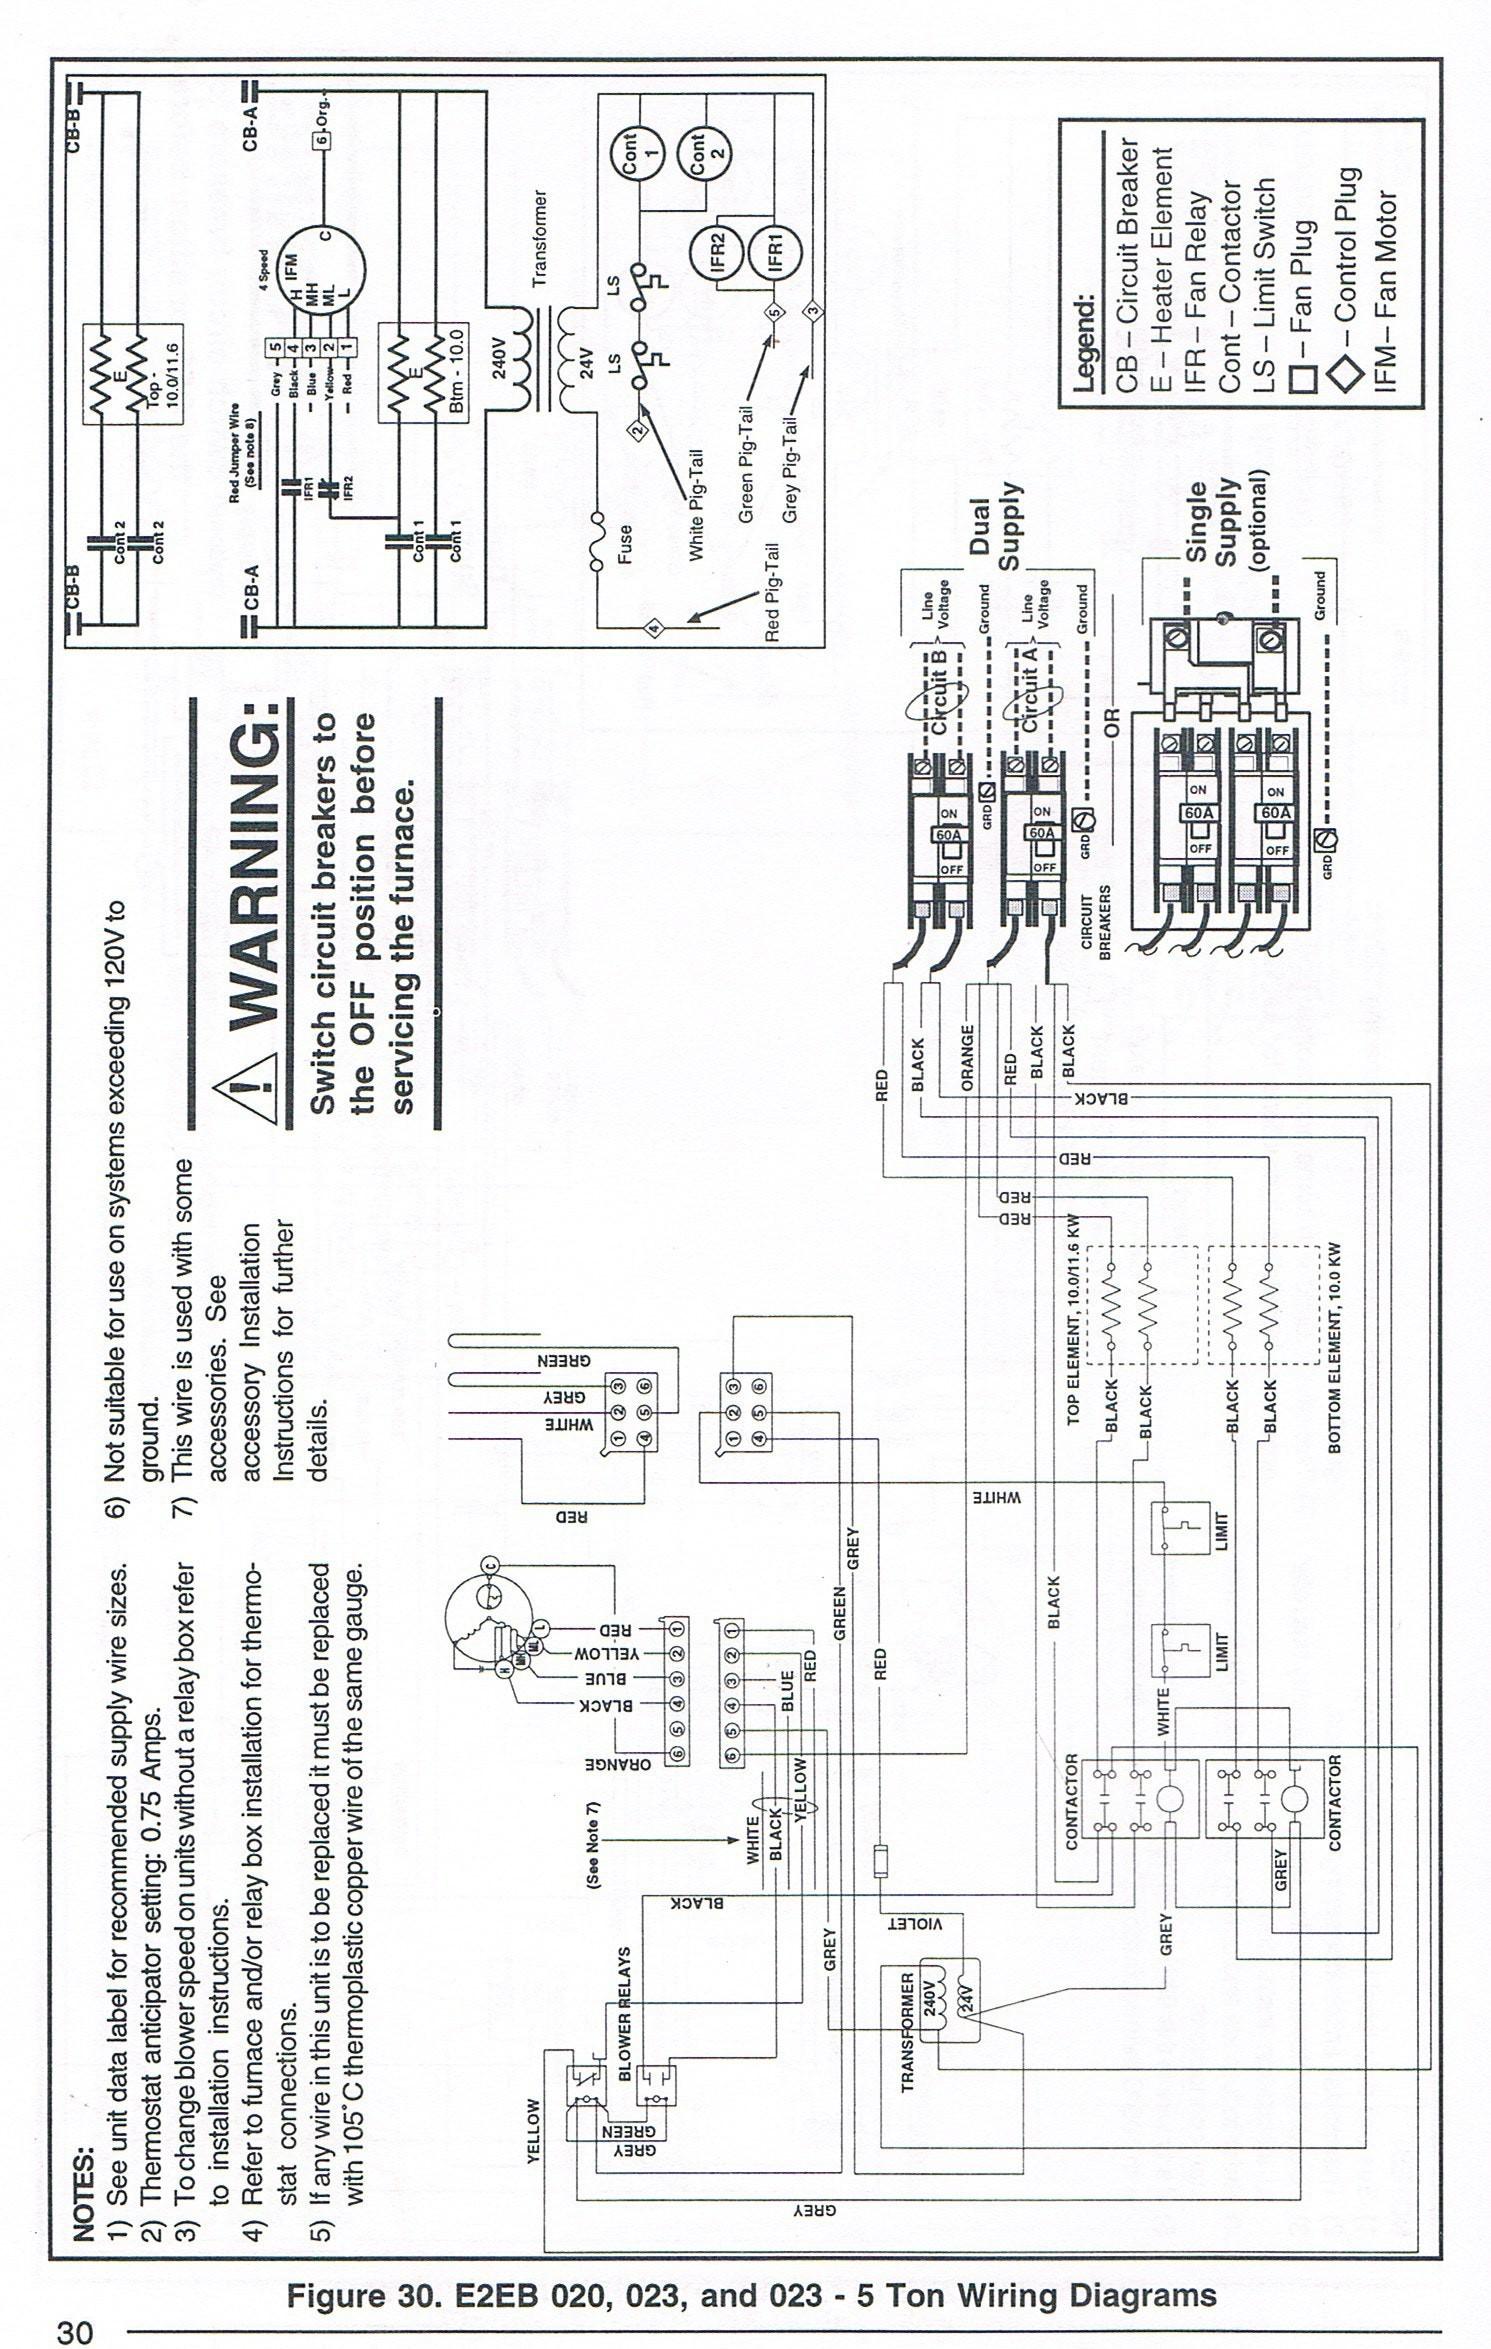 Intertherm Heat Pump Wiring Diagram - Wiring Diagram A6 on york heat pump wiring diagram, intertherm furnace parts diagram, electric heater wiring diagram, lennox heat pump wiring diagram, intertherm furnace mgha 056abfc-02 wiring-diagram, hvac heat pump wiring diagram,